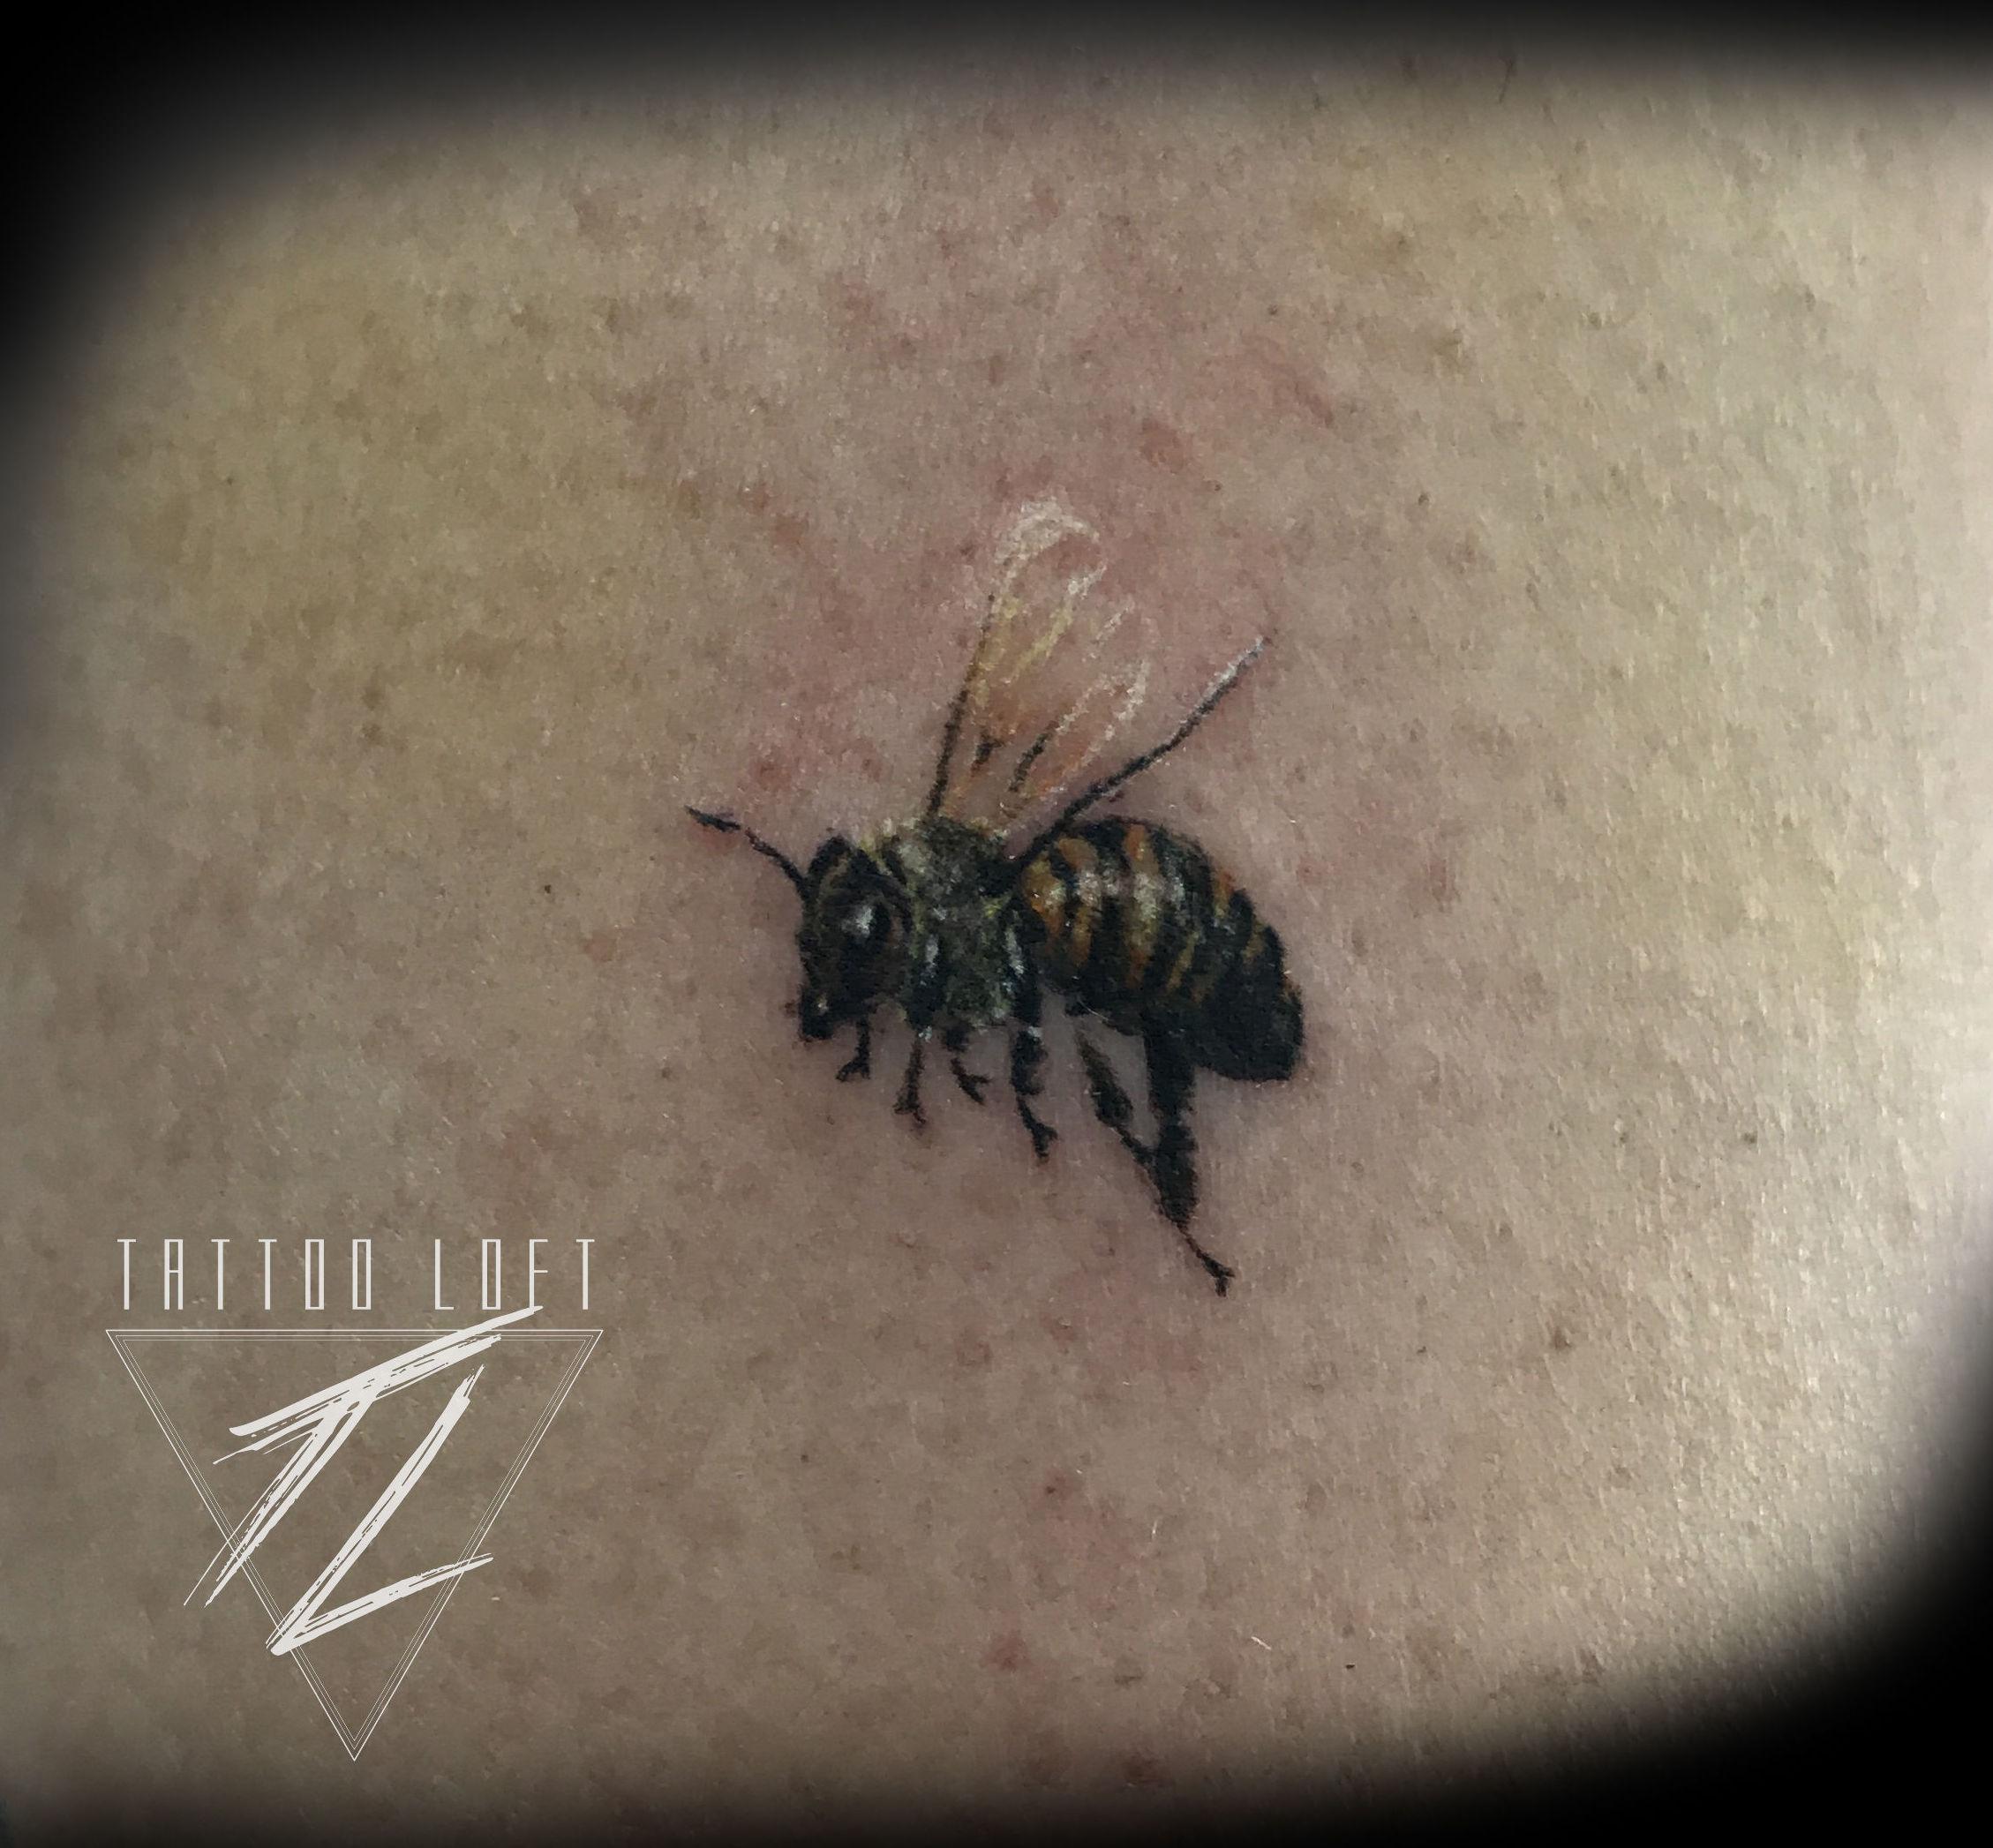 Foto 92 de Estudio artístico de tatuaje en  | Tattoo Loft